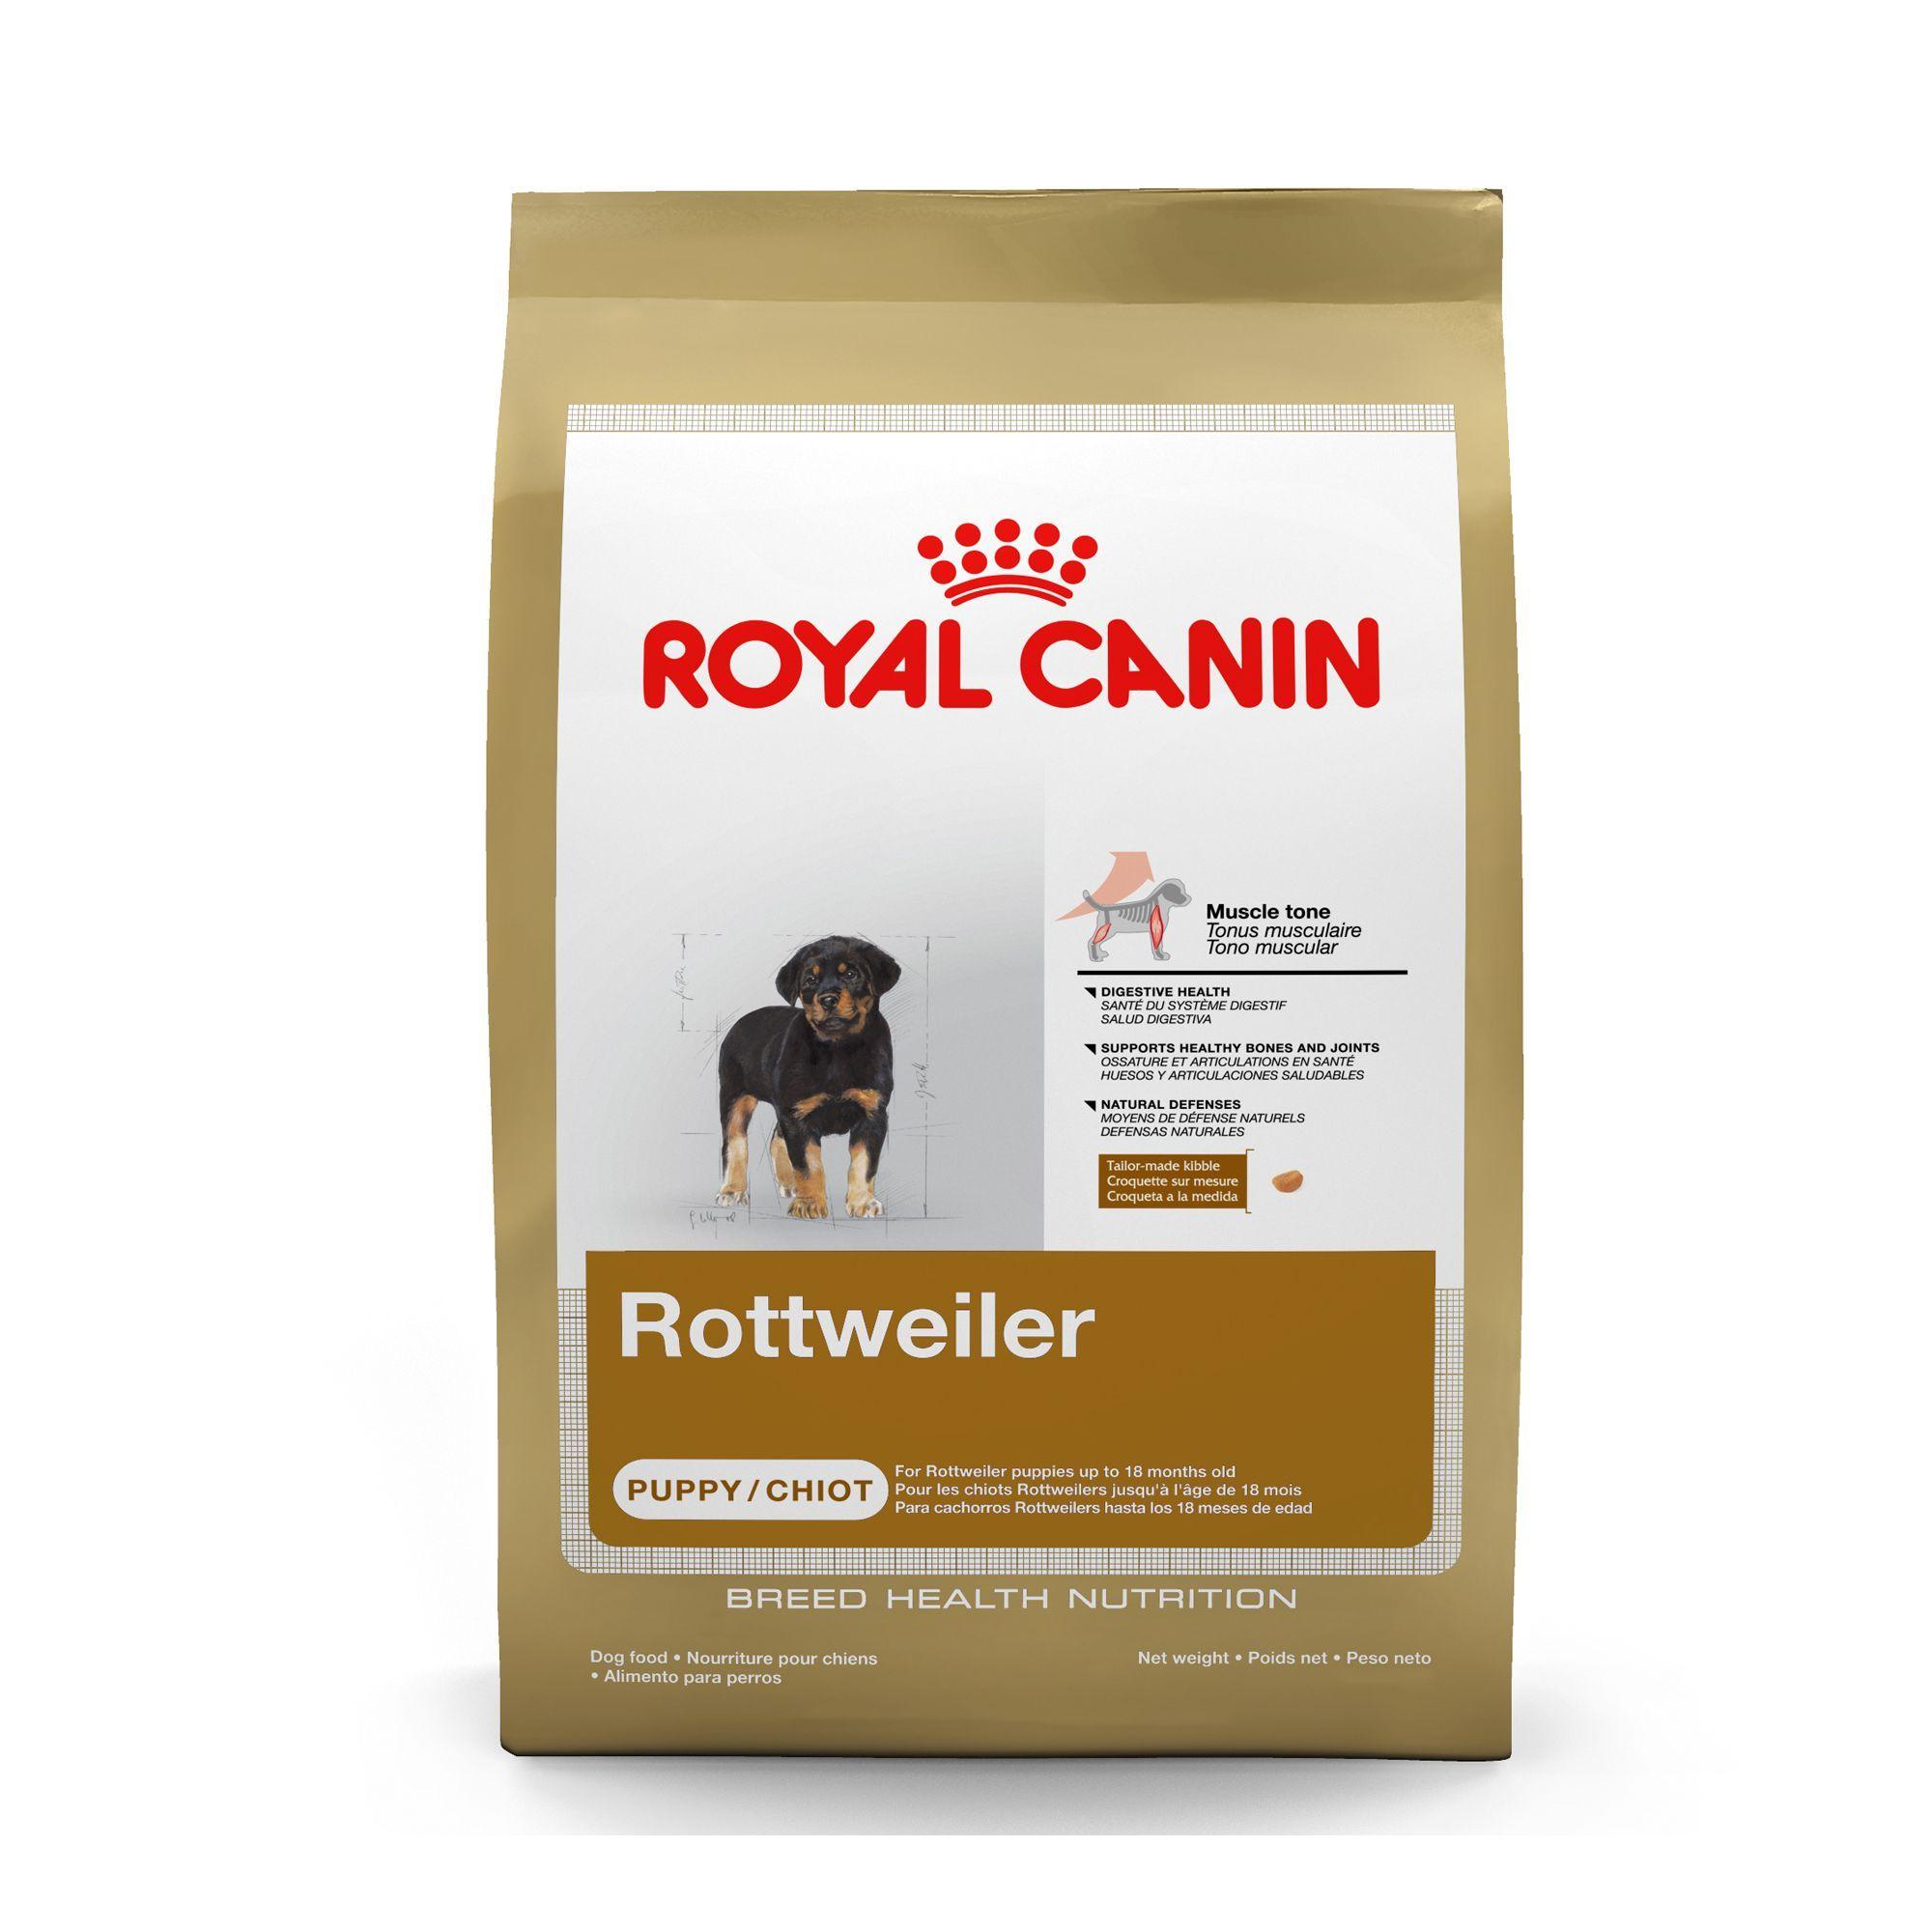 Royal Canin Rottweiler Puppy Food Beet Bone Brown Chicken